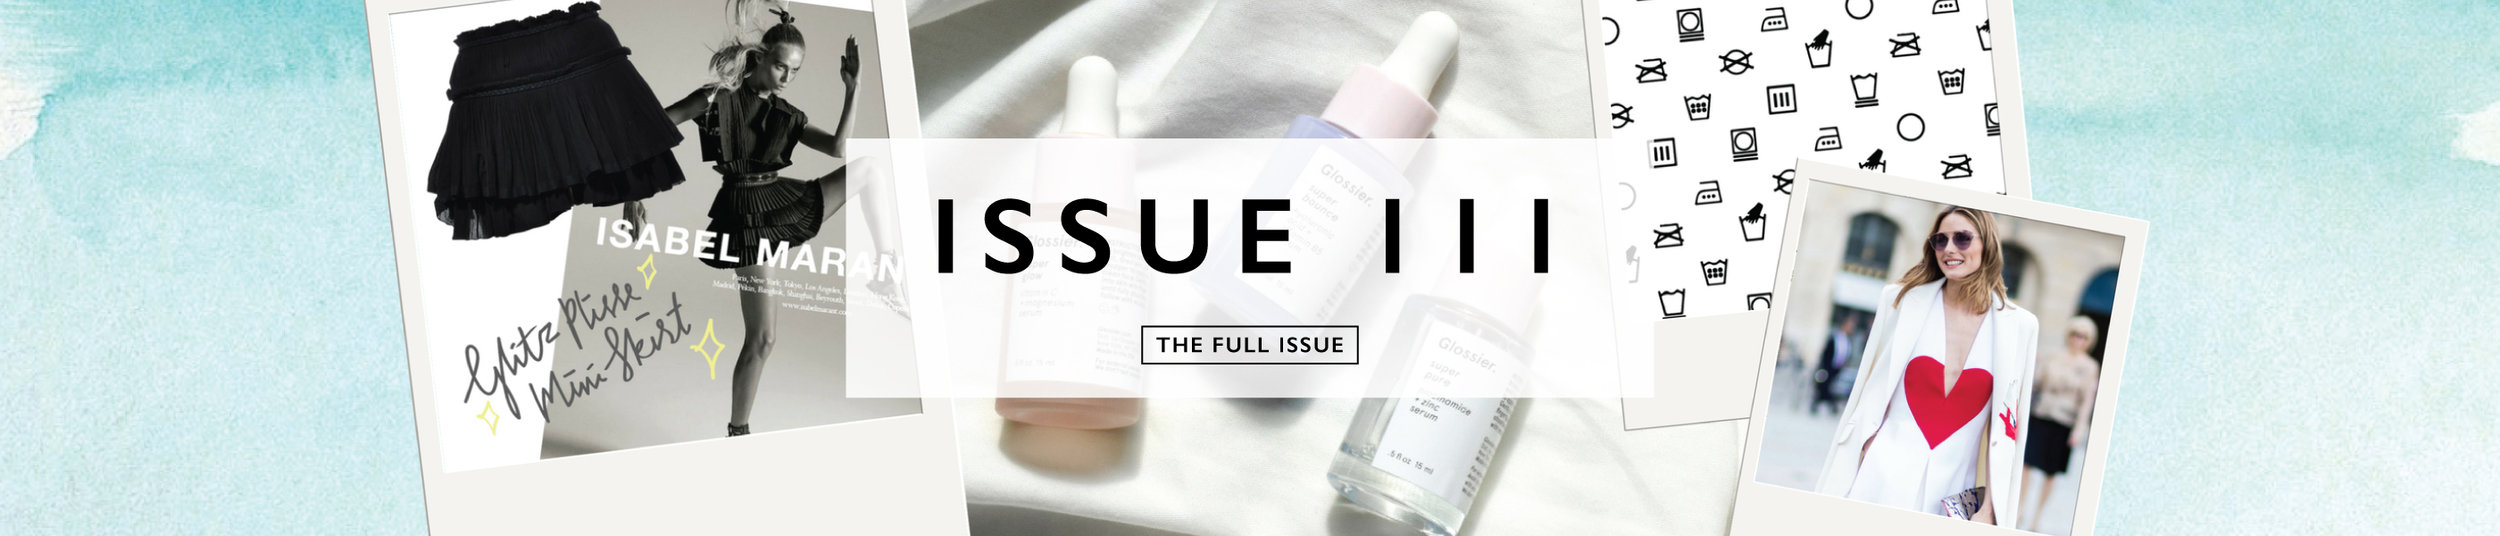 issue111.jpeg